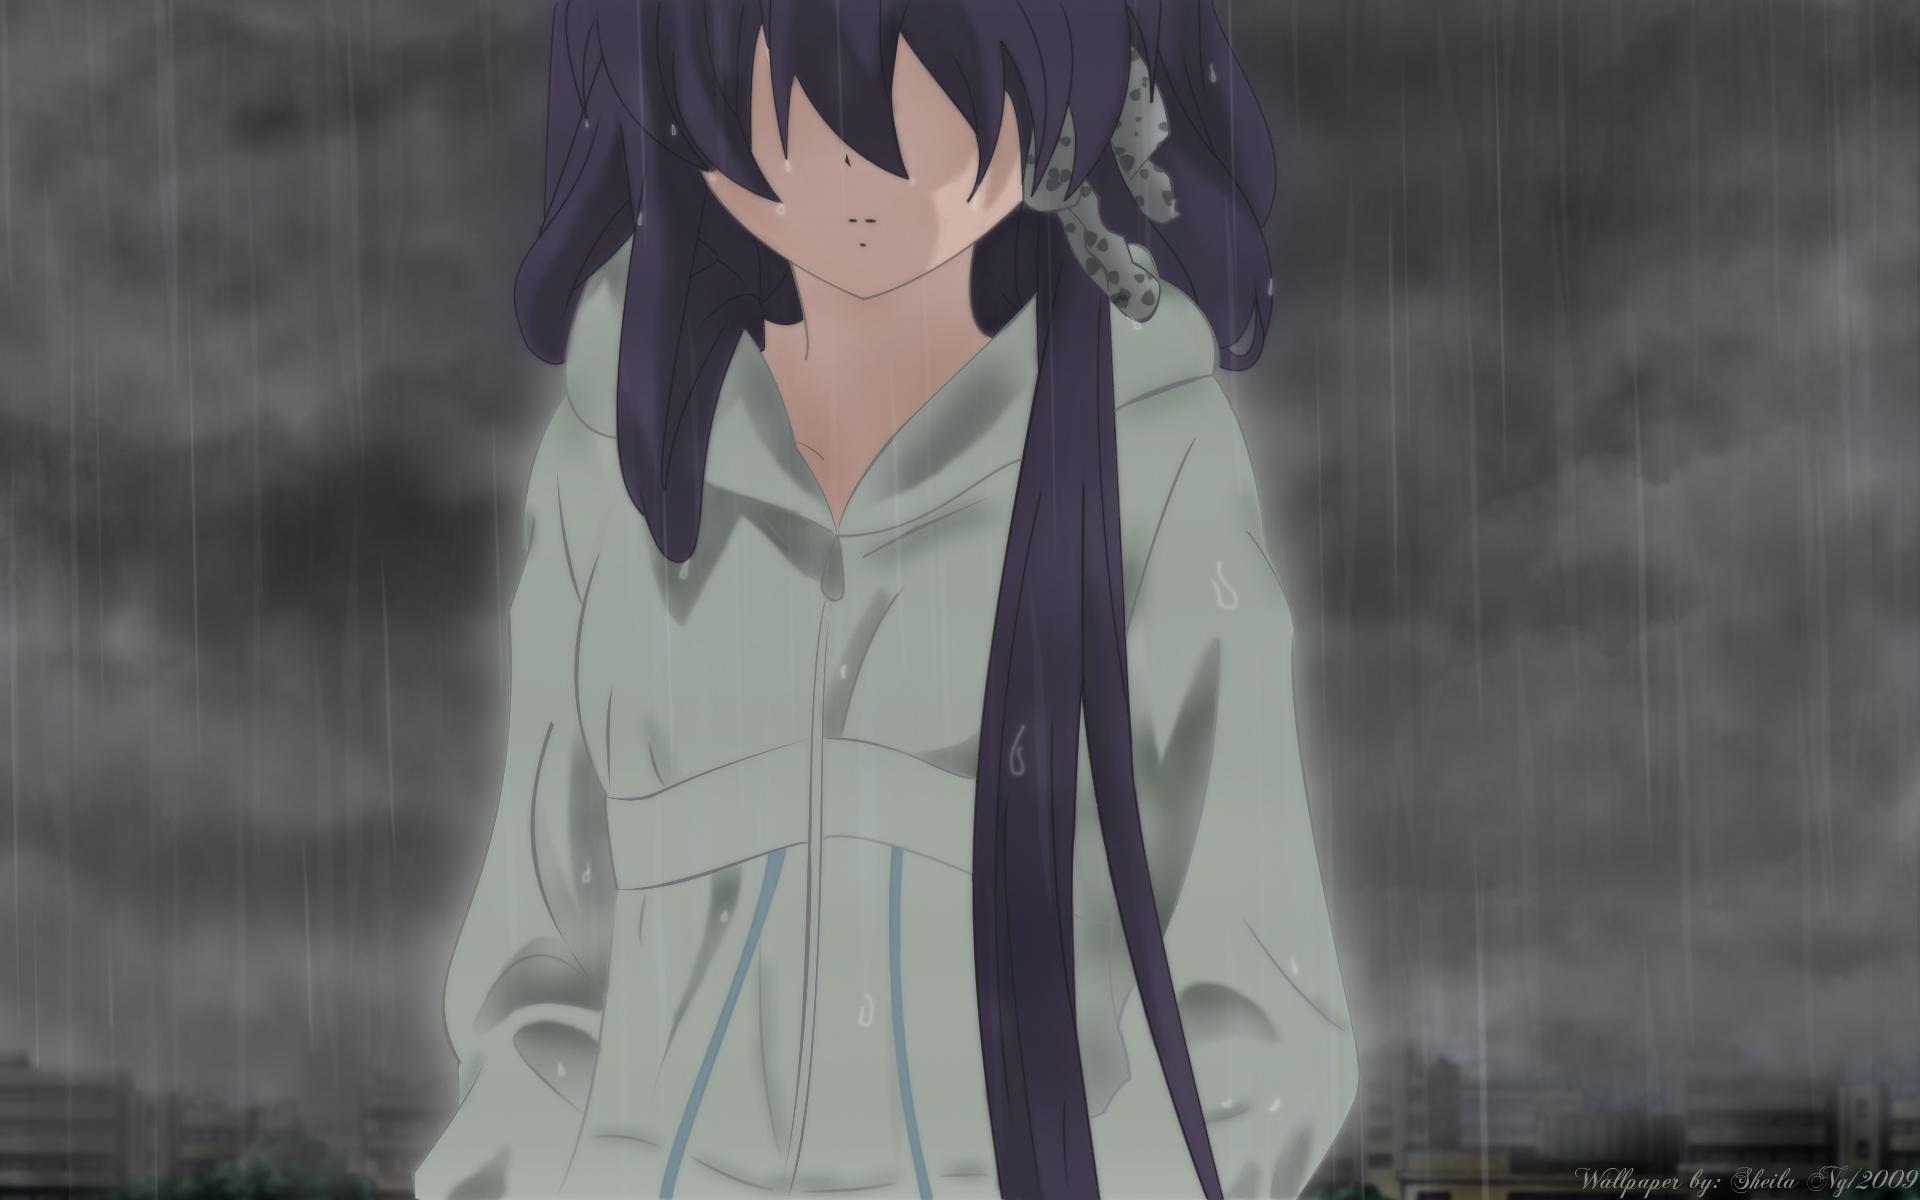 Sad anime girl wallpaper in the rain Wallpaper by Sheila 2009 1920x1200